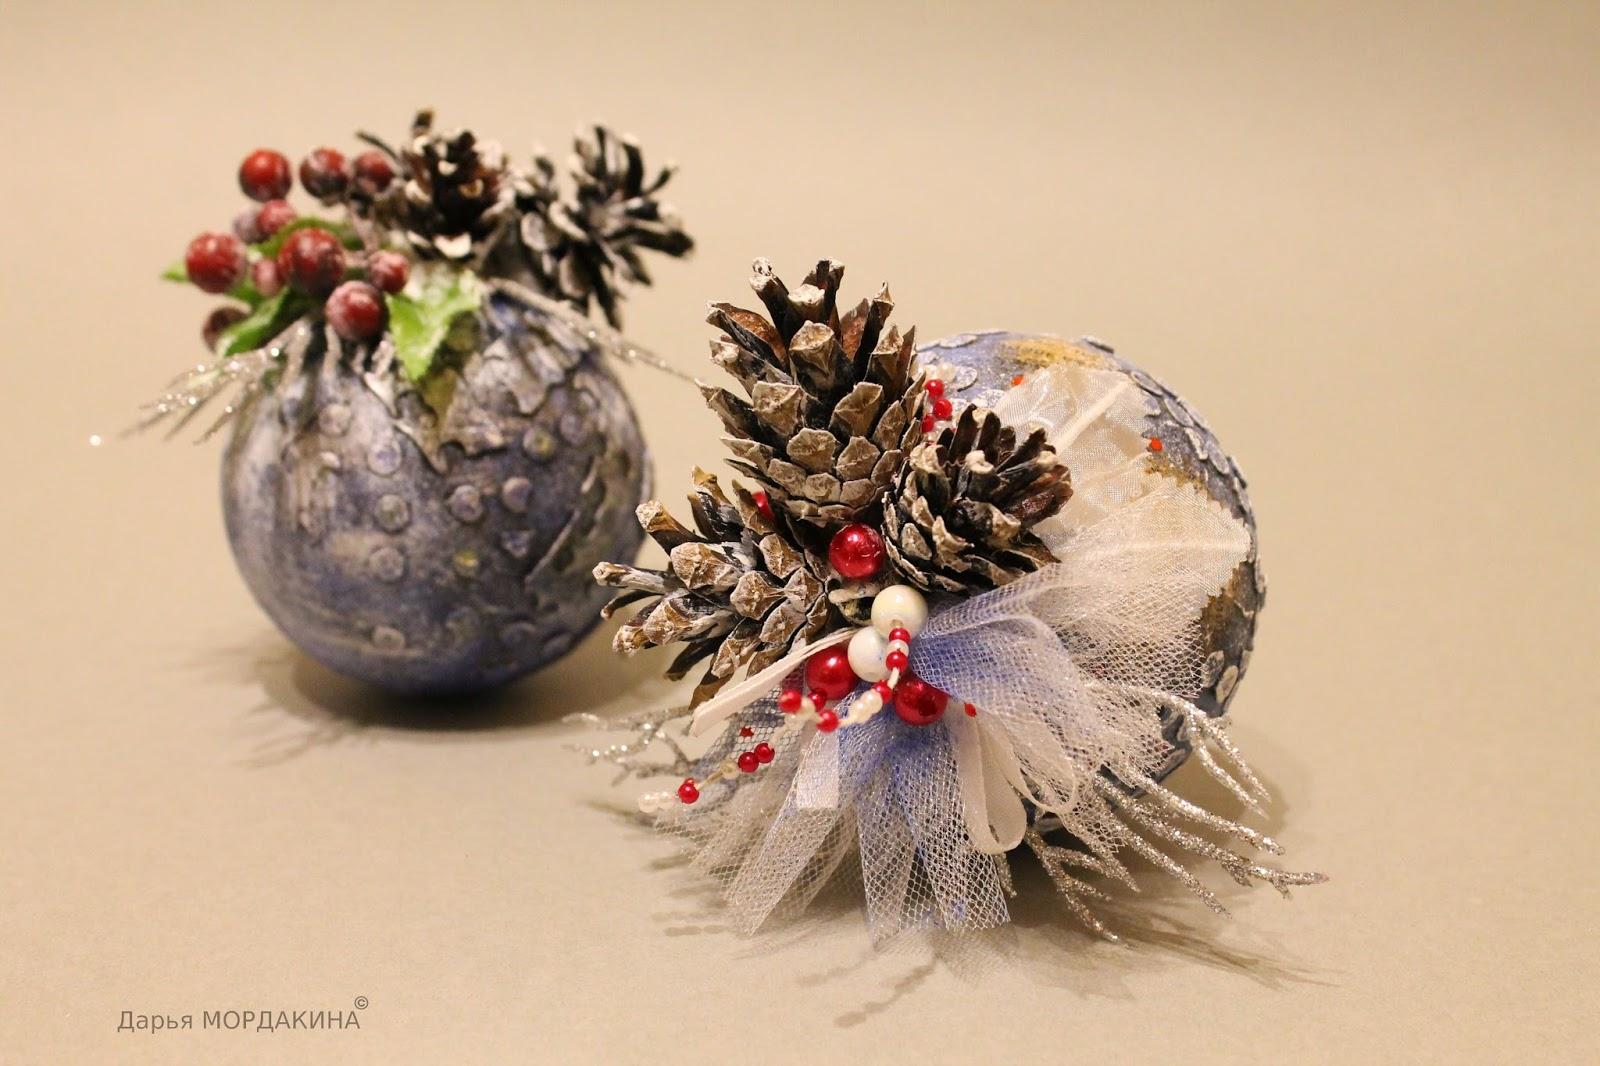 новый год, шар, шишки, елочный шарик, калина, декупаж, зима, елка